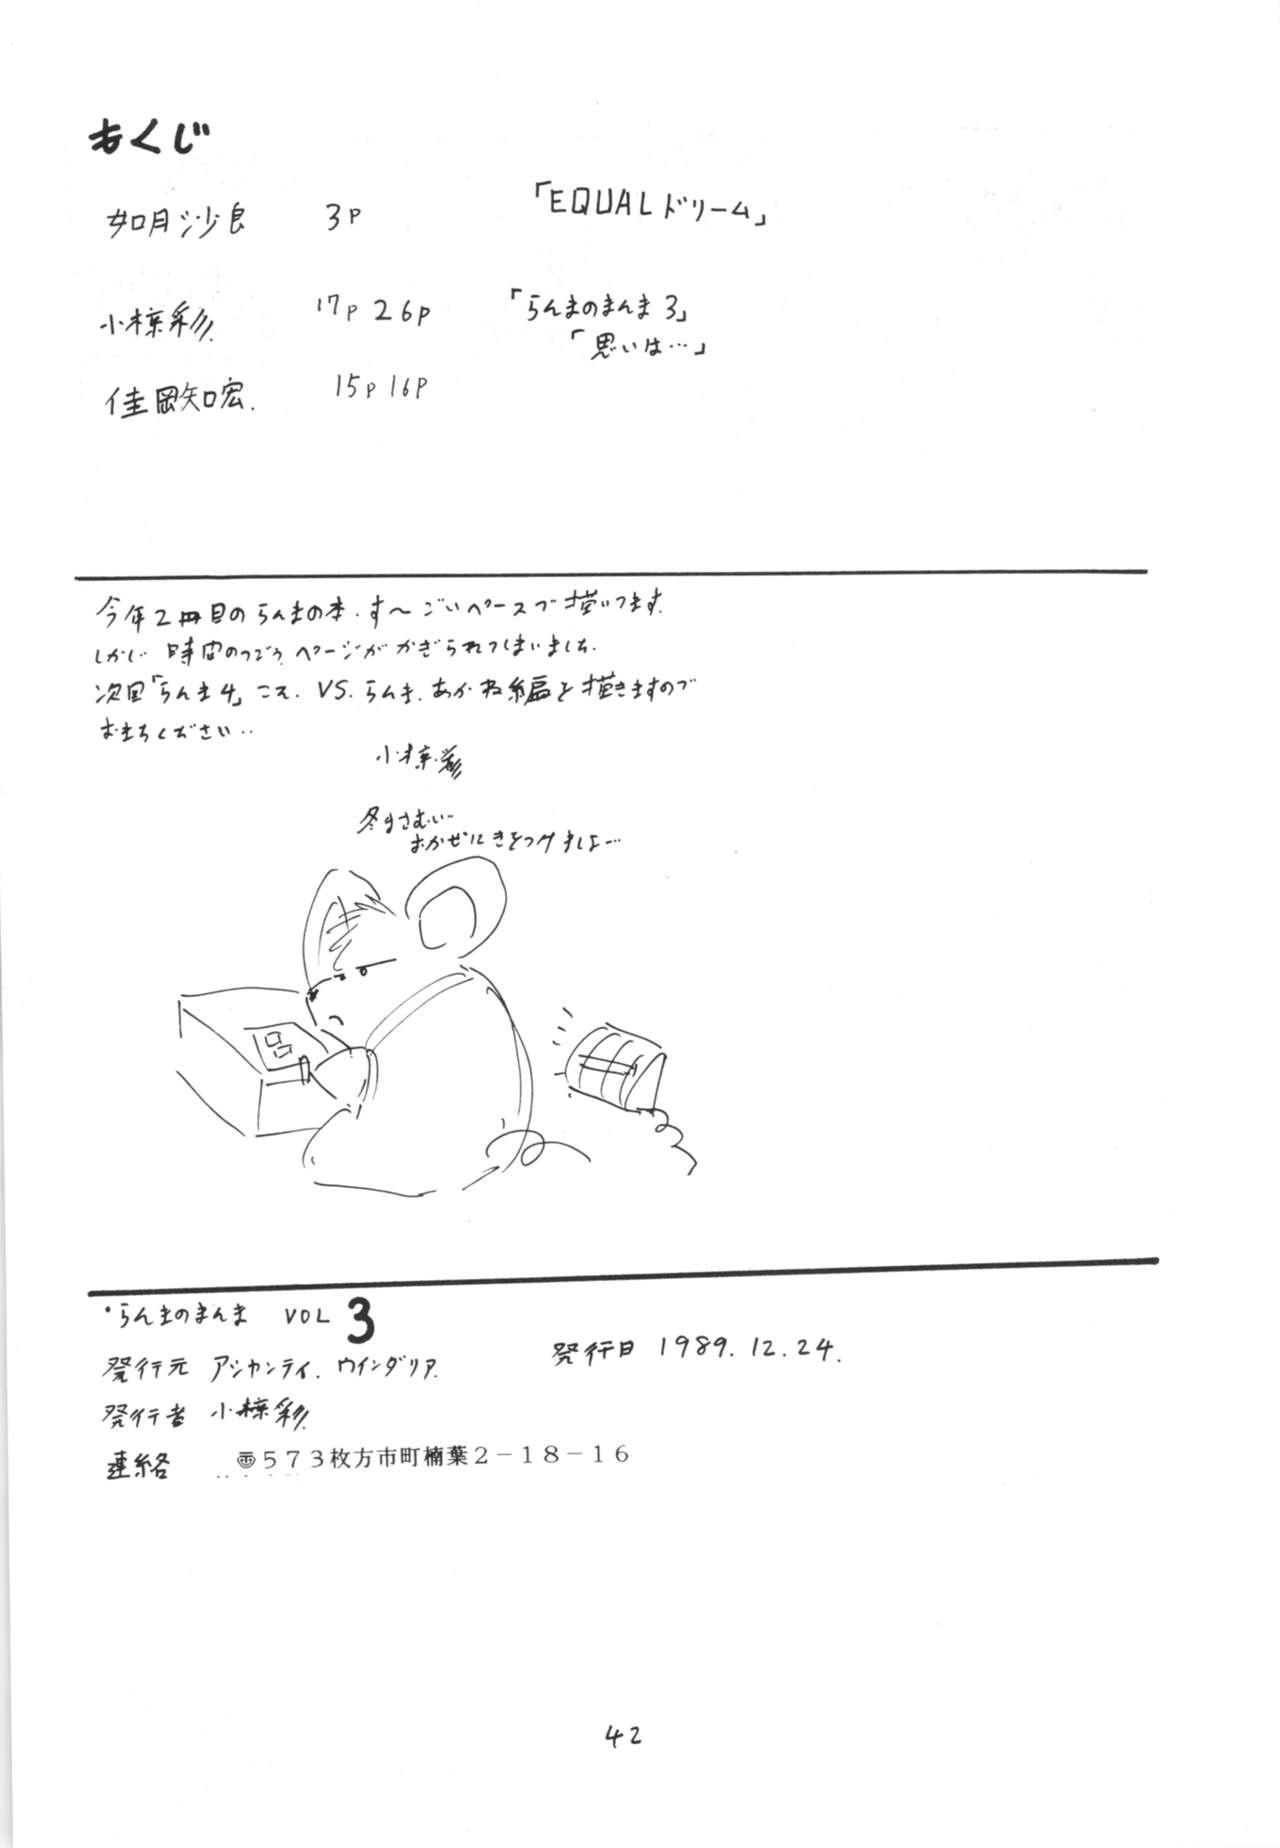 Ranma no Manma 3 v2 40